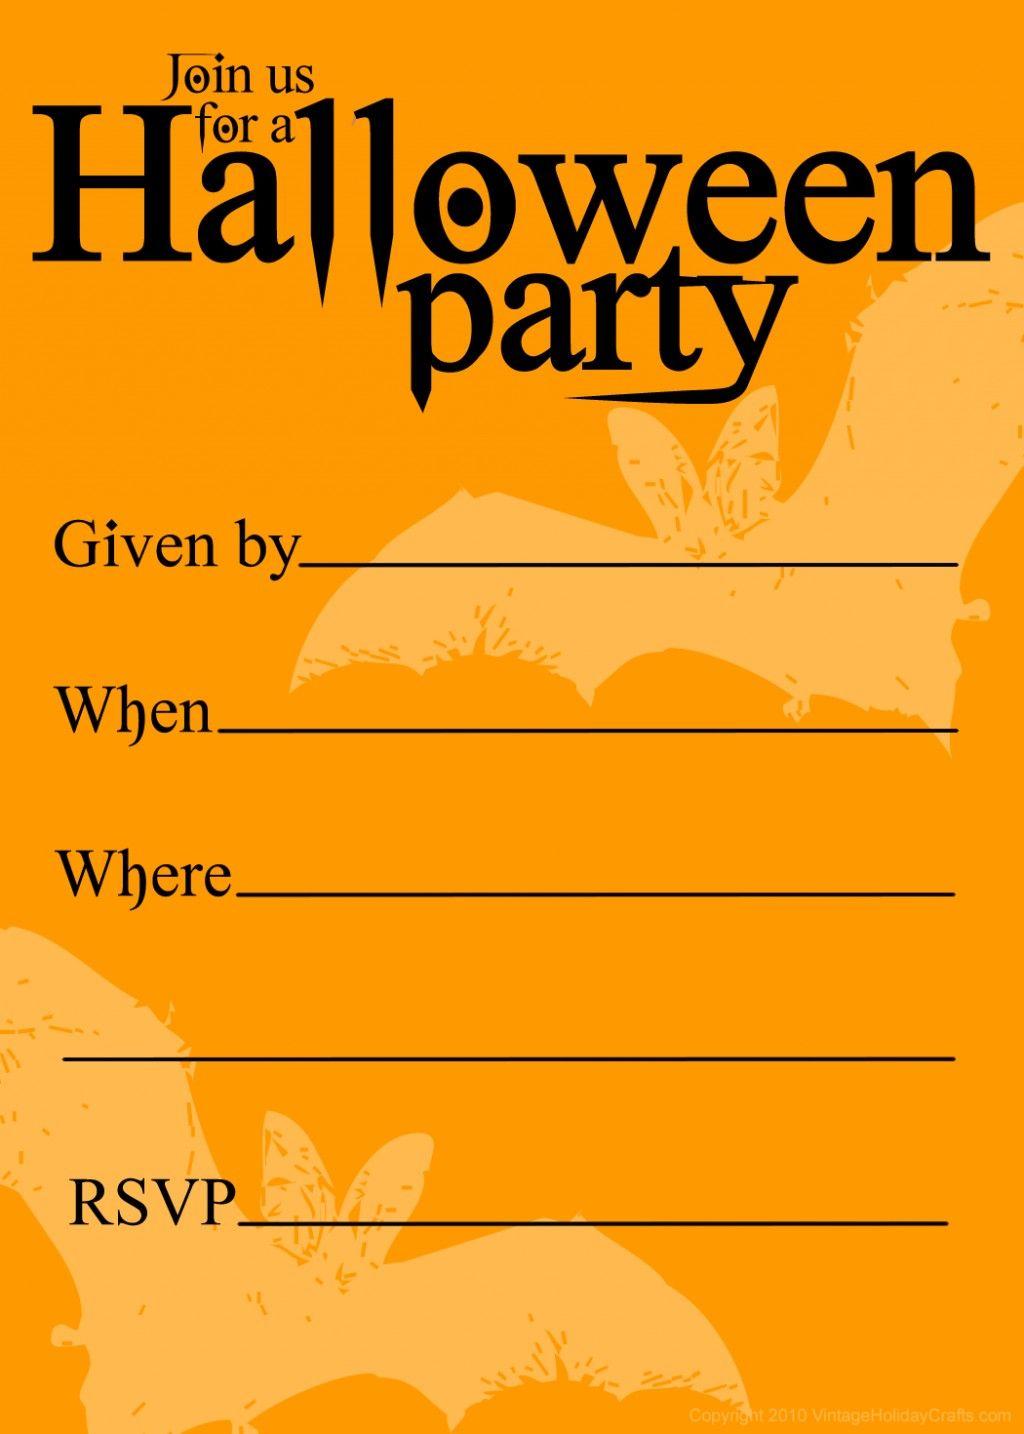 Free Printable Halloween Birthday Invitations Templates | Halloween - Free Halloween Birthday Invitation Templates Printable